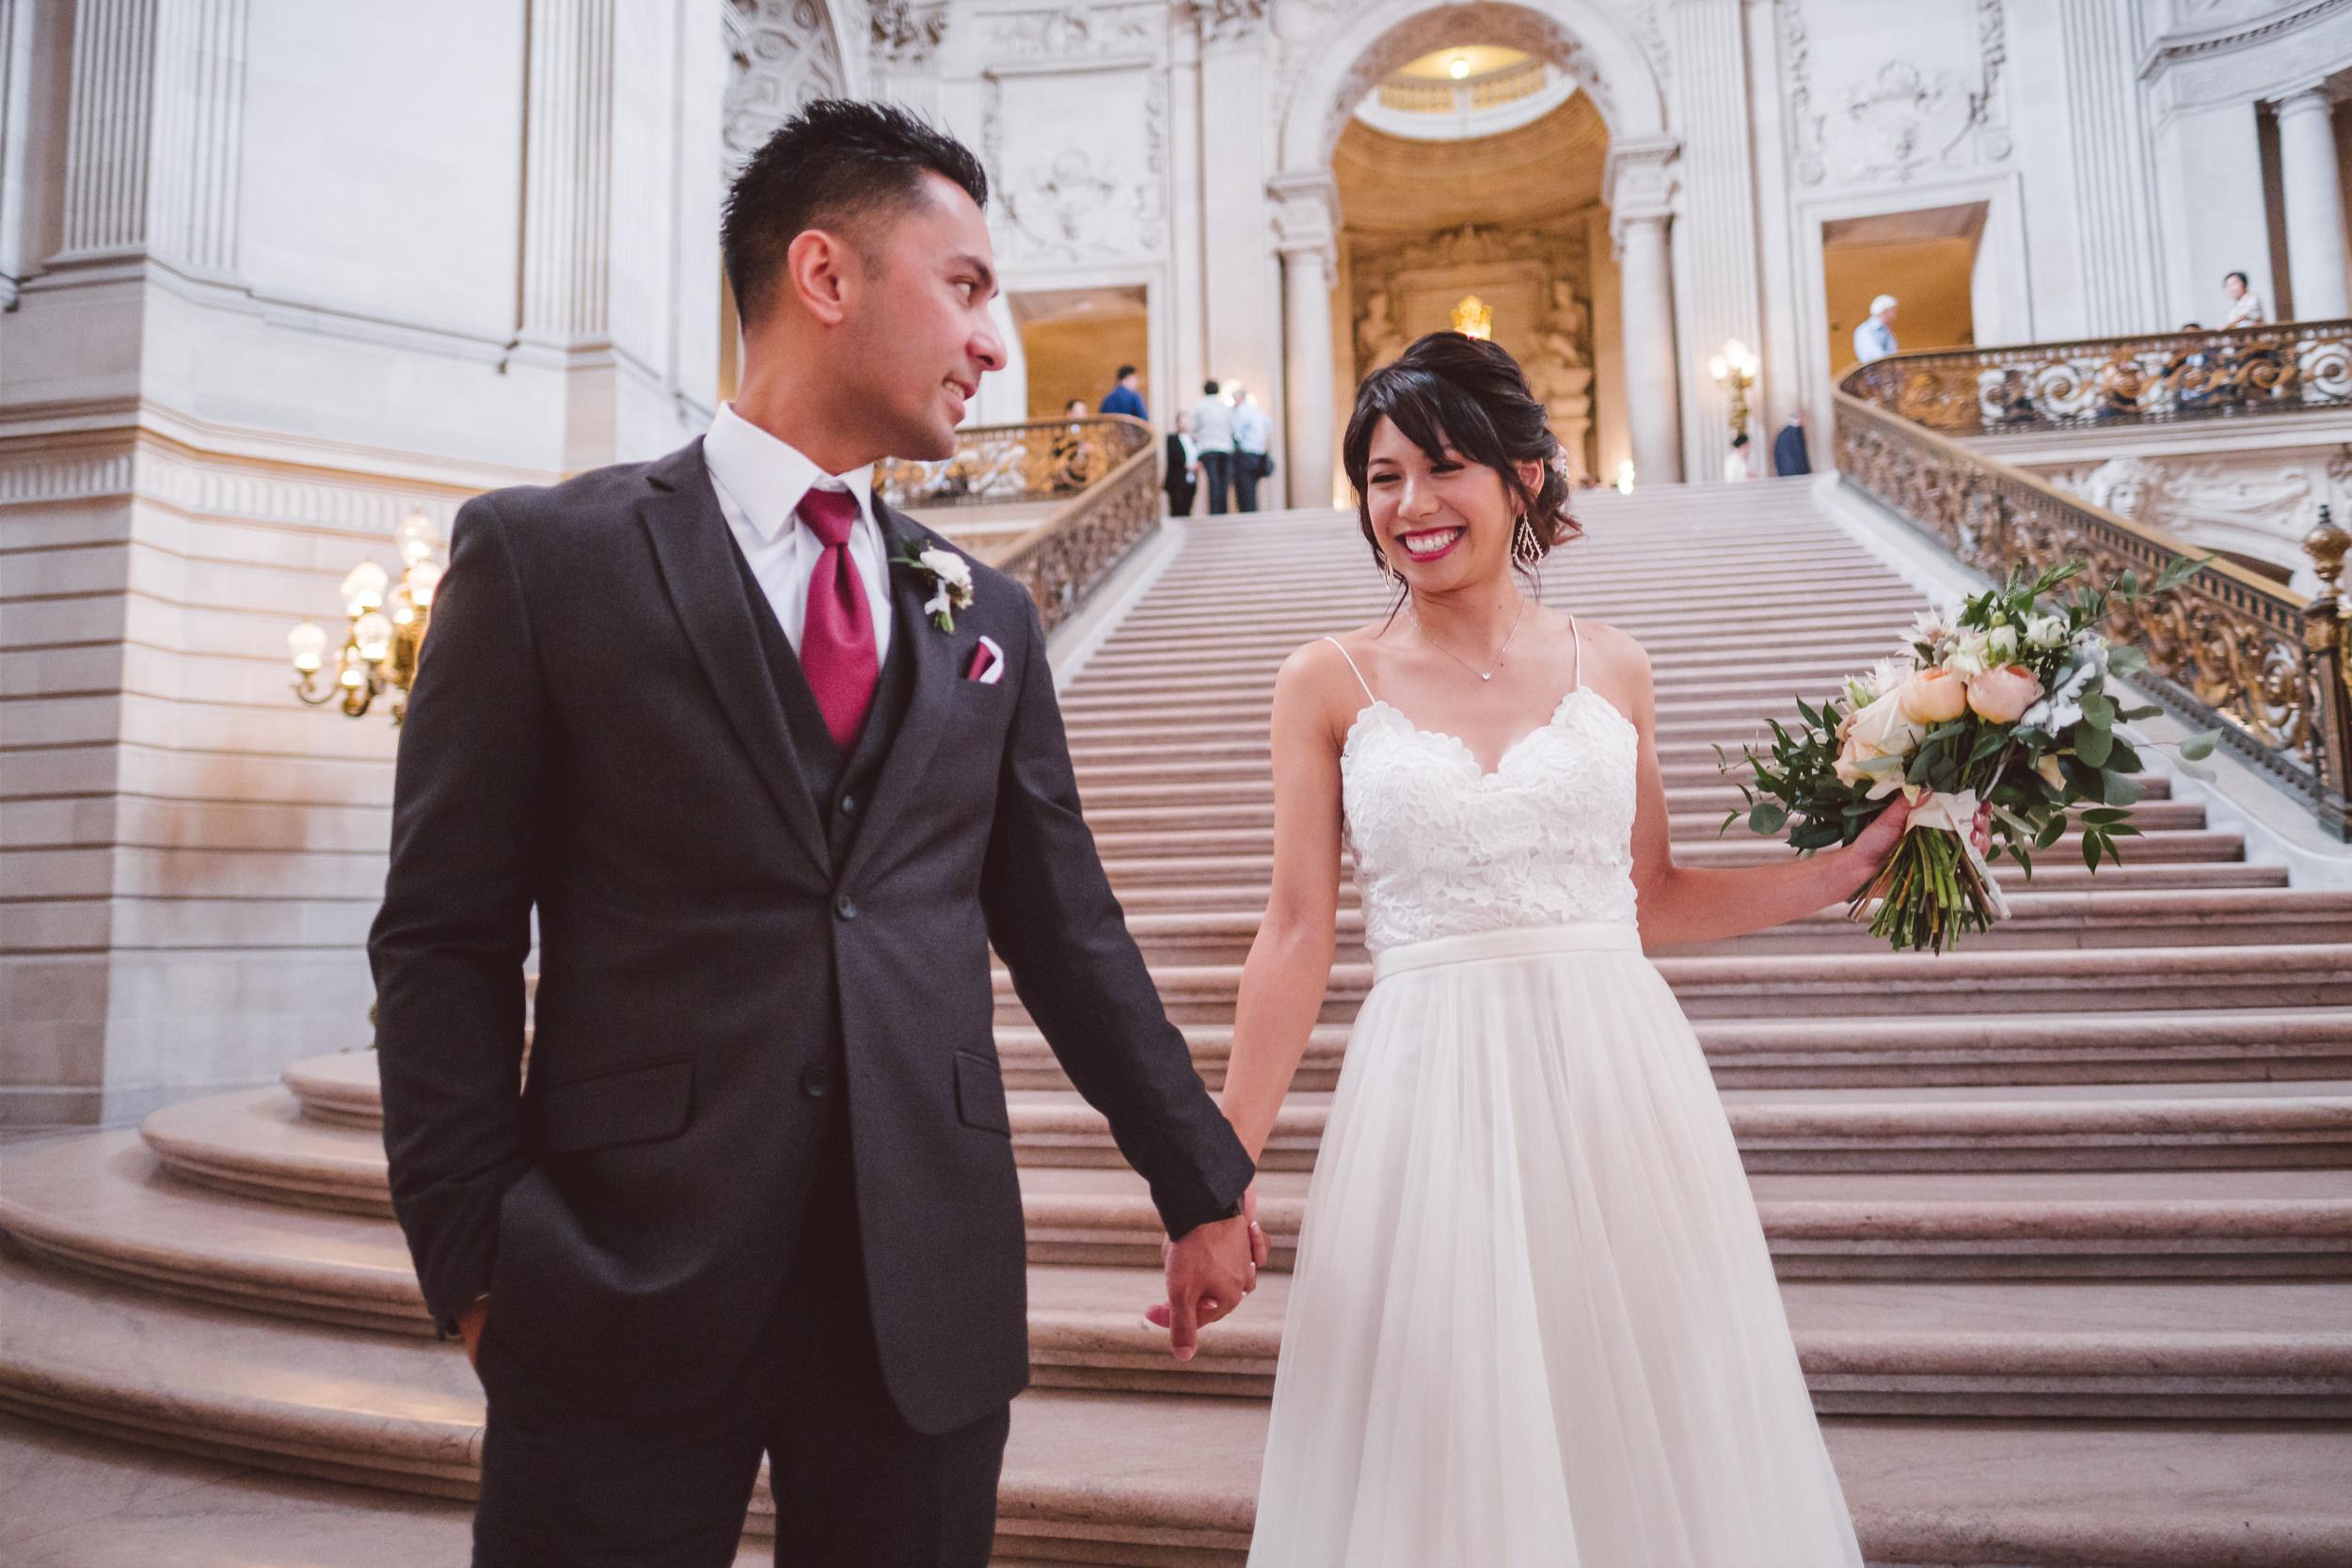 San-Francisco-City-Hall-Wedding-Photography-069.jpg